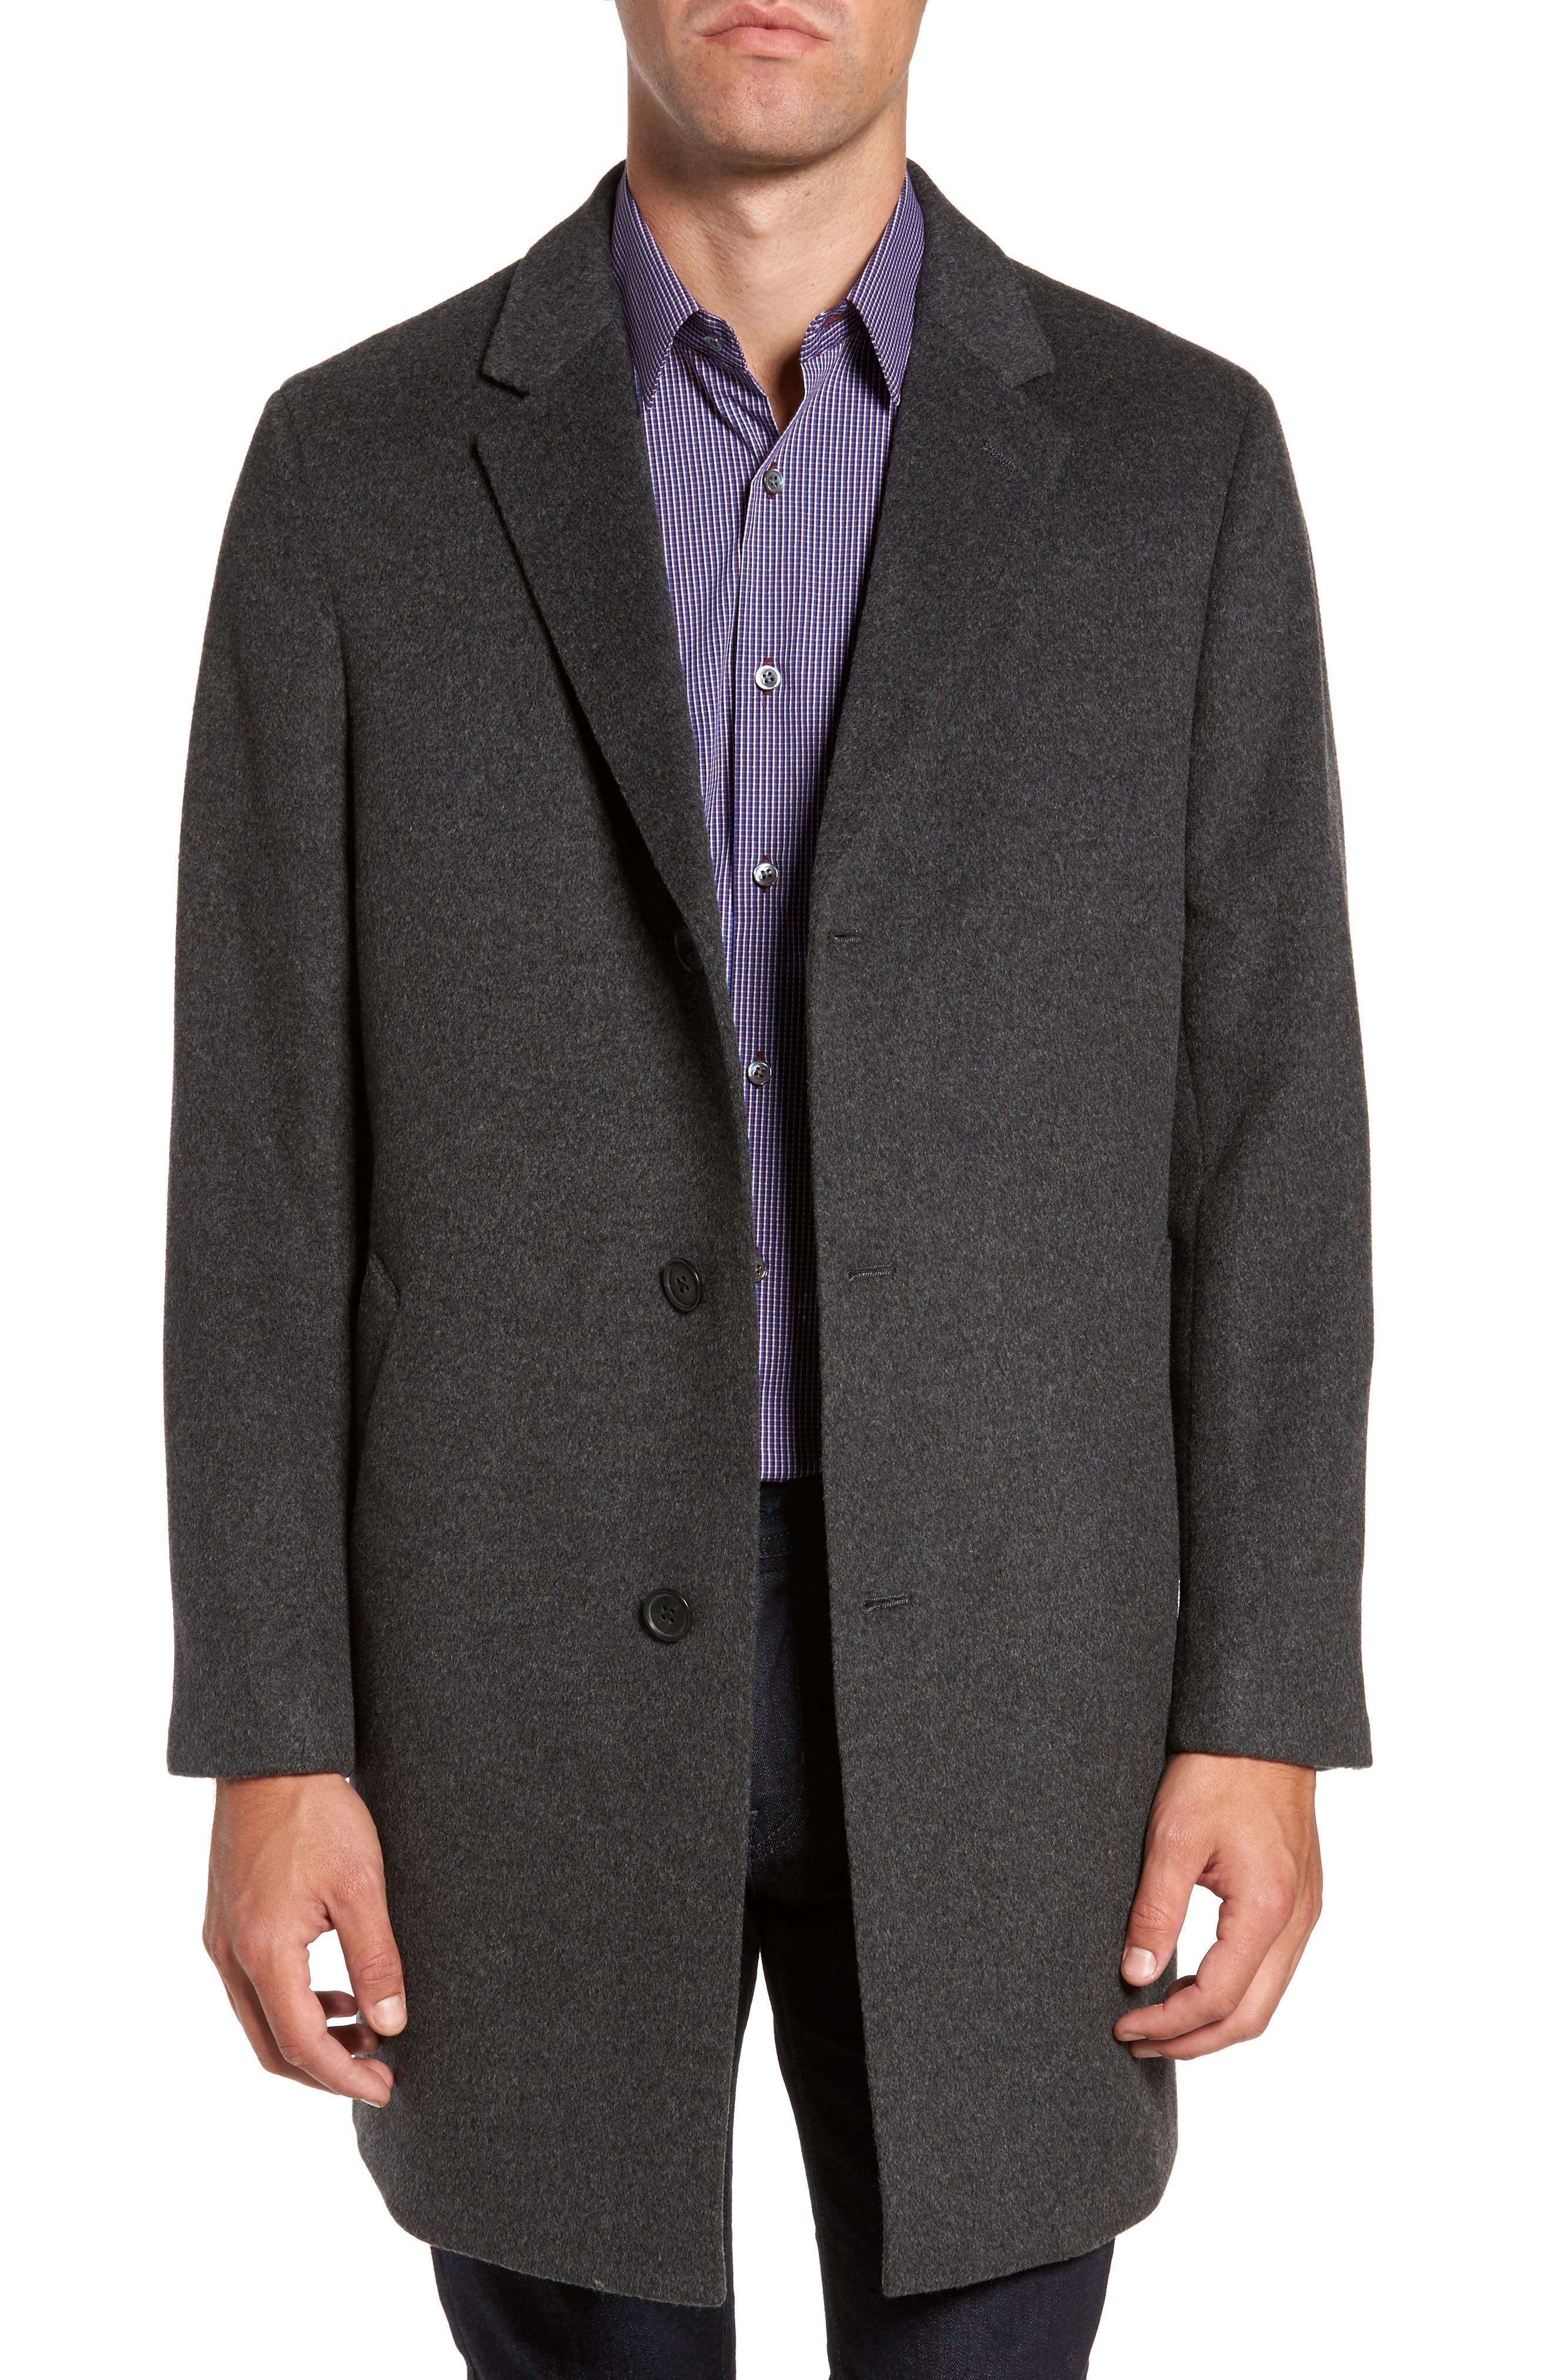 Alternate Image 1 Selected - Nordstrom Men's Shop Mason Wool & Cashmere Overcoat